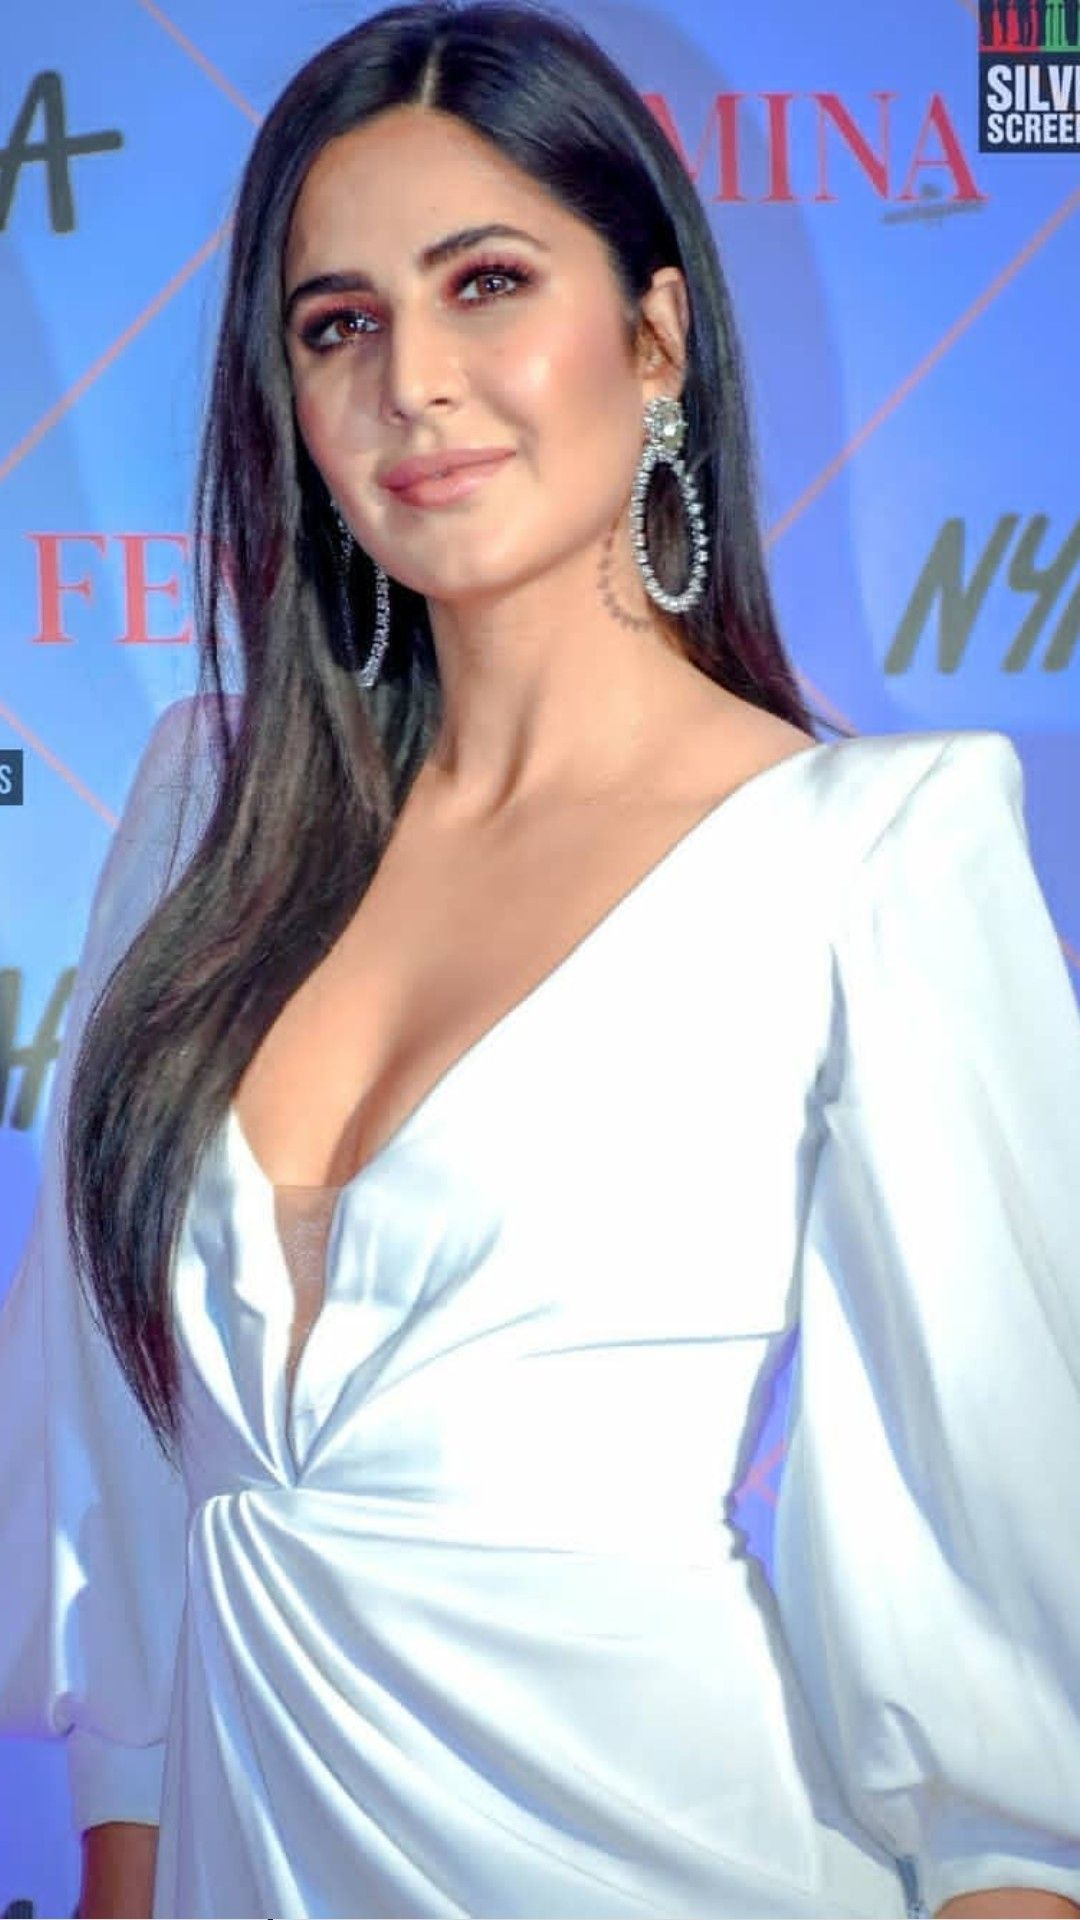 Pin by pravin on Malaika Arora in 2020 | Bollywood actress